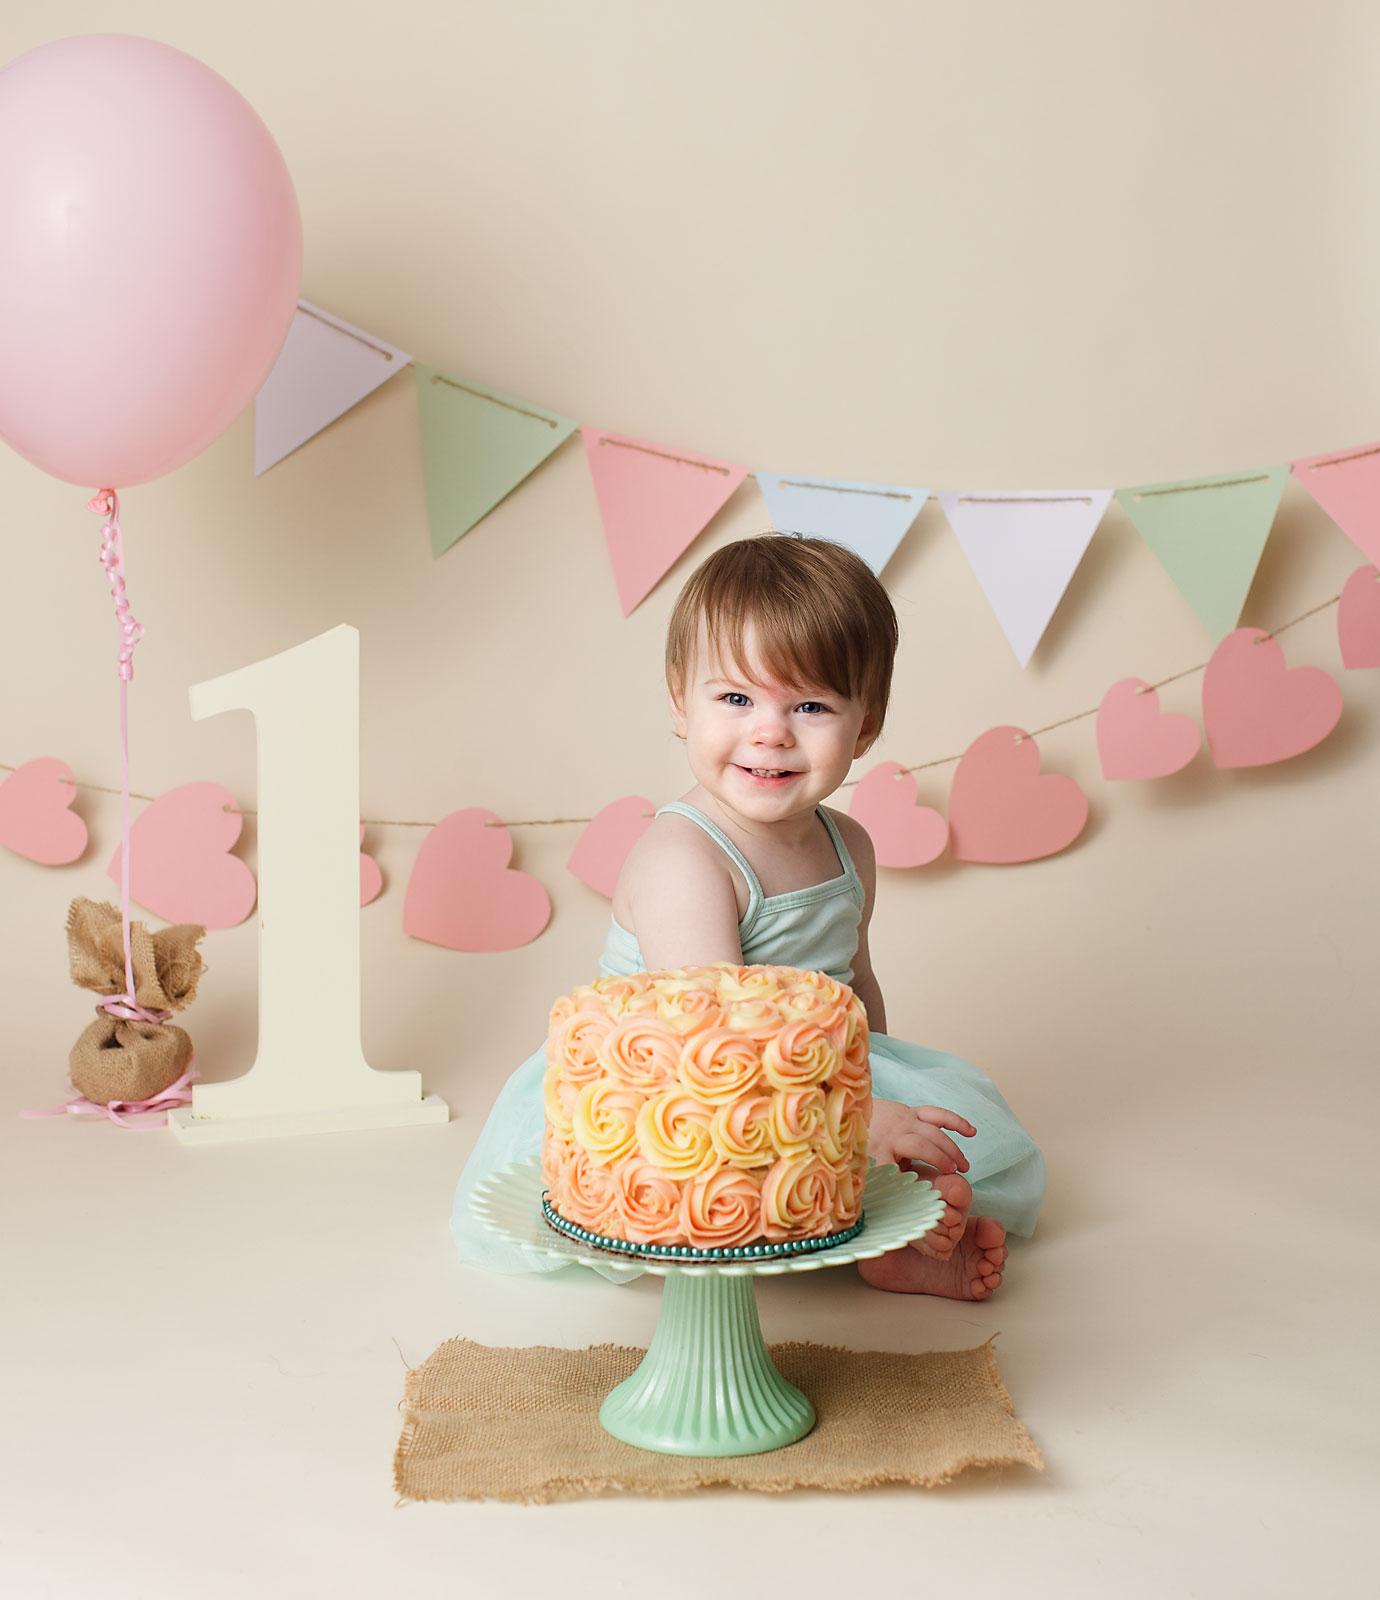 Newmarket cake smash photography, Keswick, Sutton, Georgina, 1st birthday, photography, photographer, photo, pic, shoot, picture